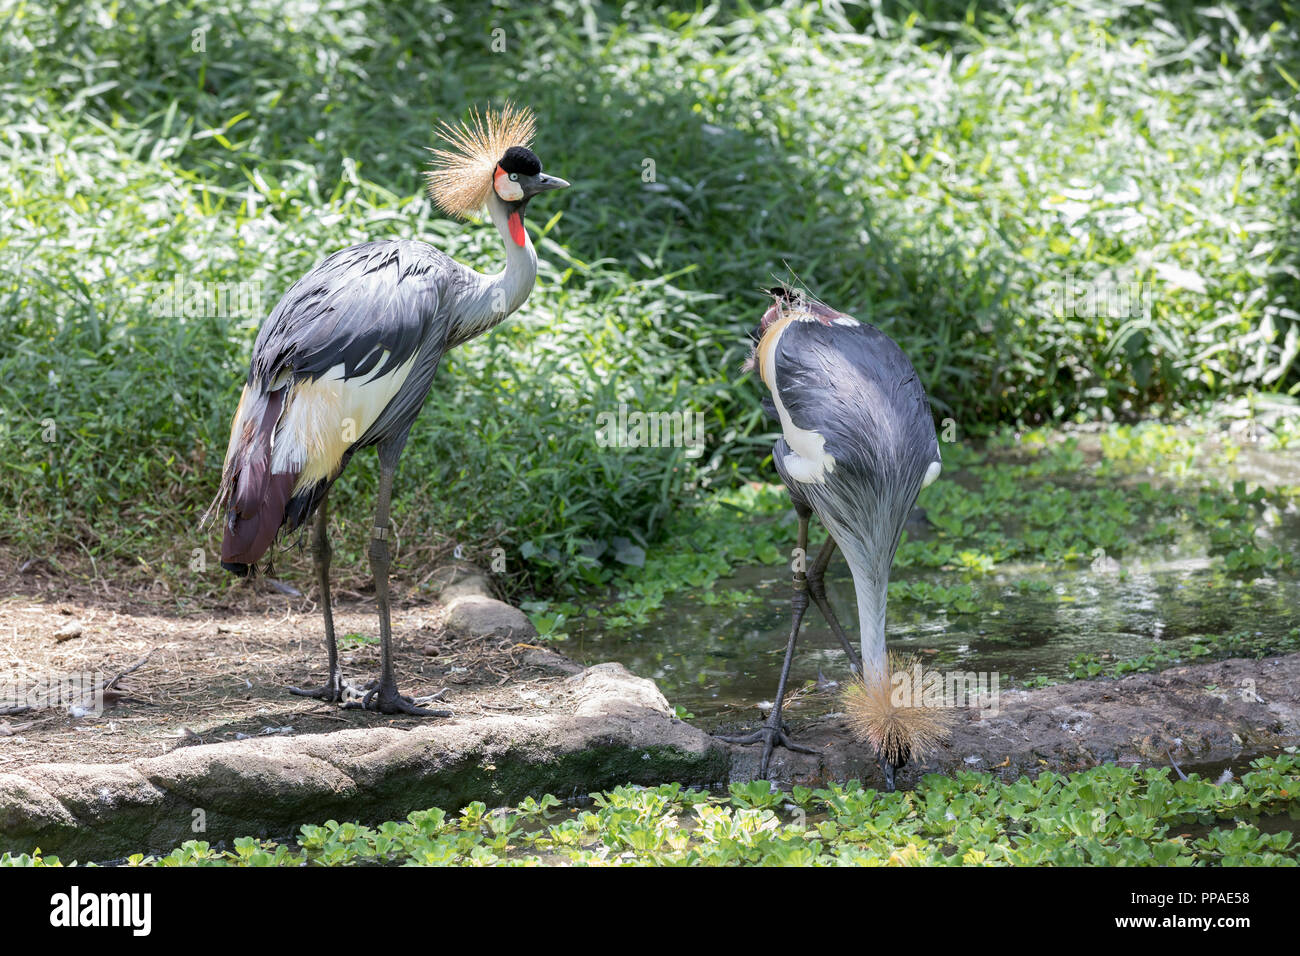 SGP, Singapur, 20.02.2017, Singapur Jurong Bird Park Südafrika-Kronenkranich (Balearica regulorum) © 2017 Christoph Hermann, Bild-Kunst Urheber 707707 - Stock Image